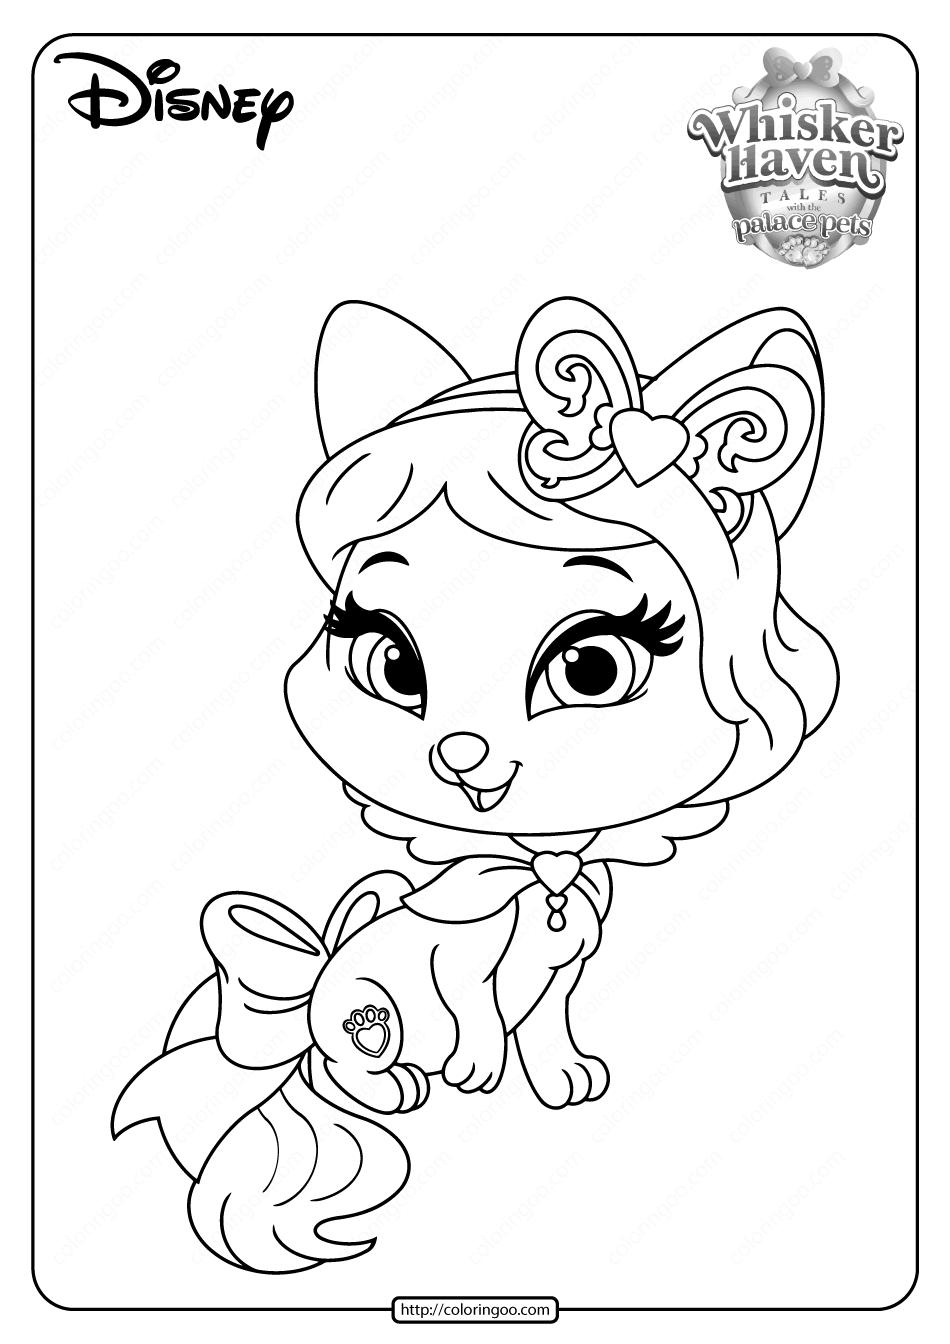 Printable Palace Pets Honeycake Pdf Coloring Pages Palace Pets Coloring Pages Disney Princess Palace Pets